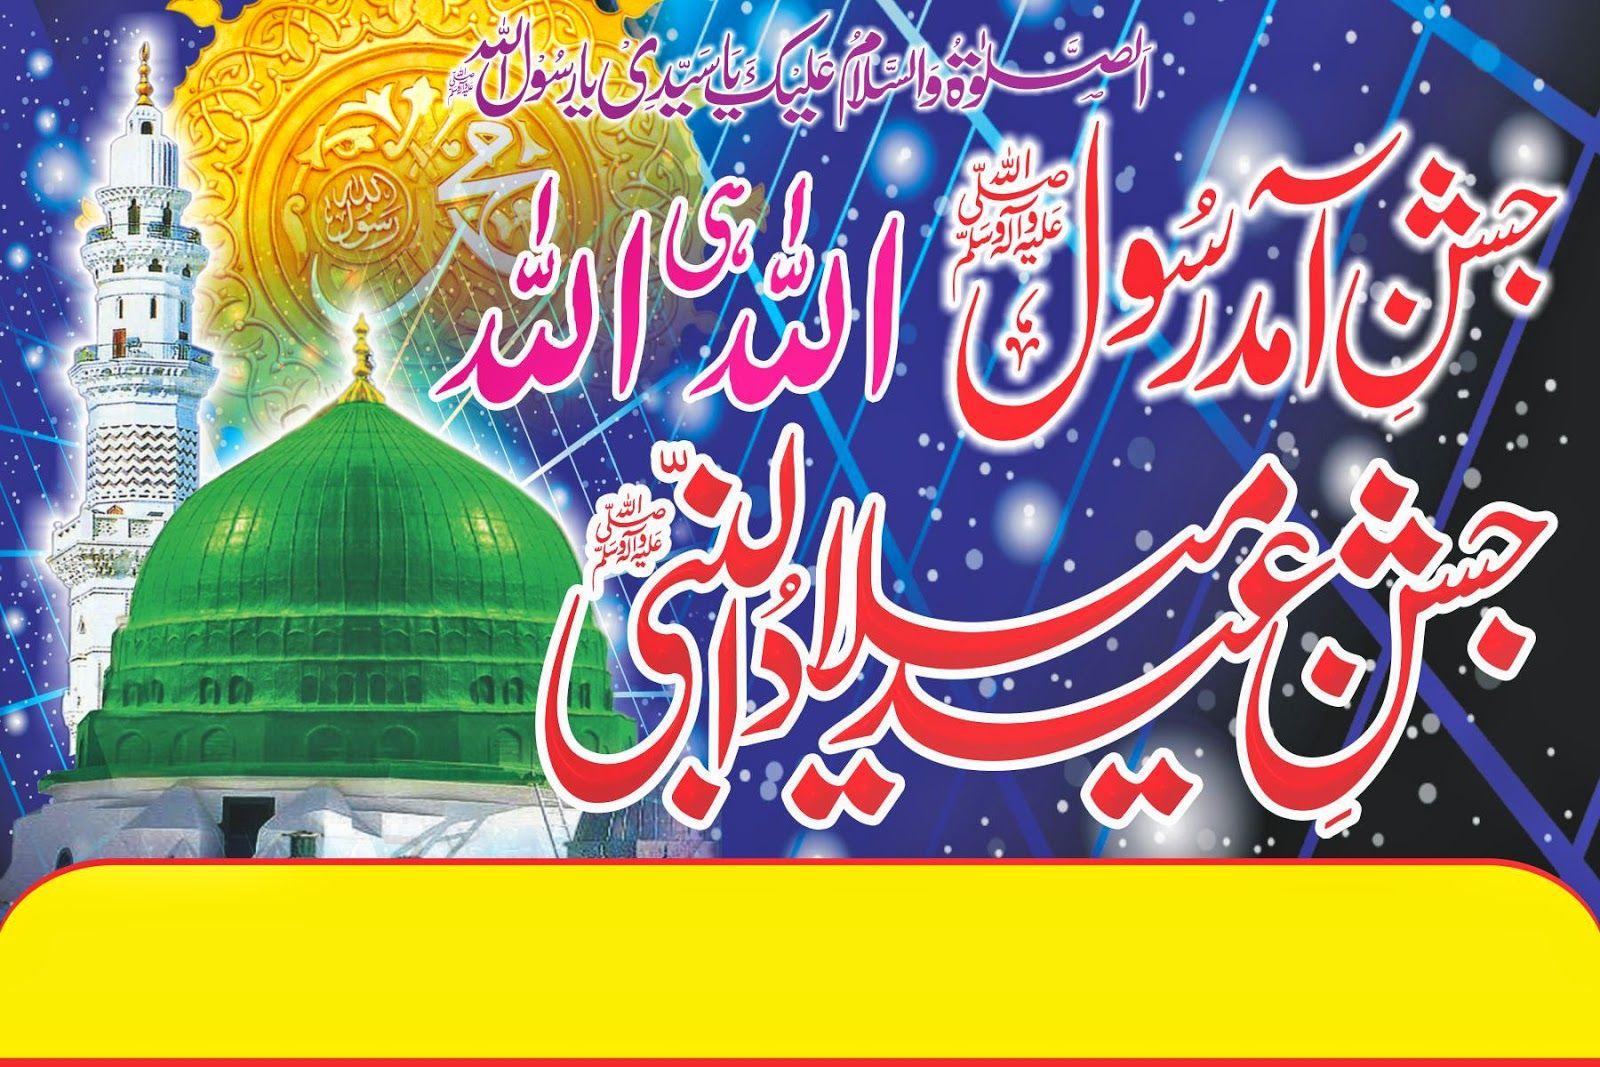 Qaisar Rajput Sulehria (qaisaraligc) on Pinterest